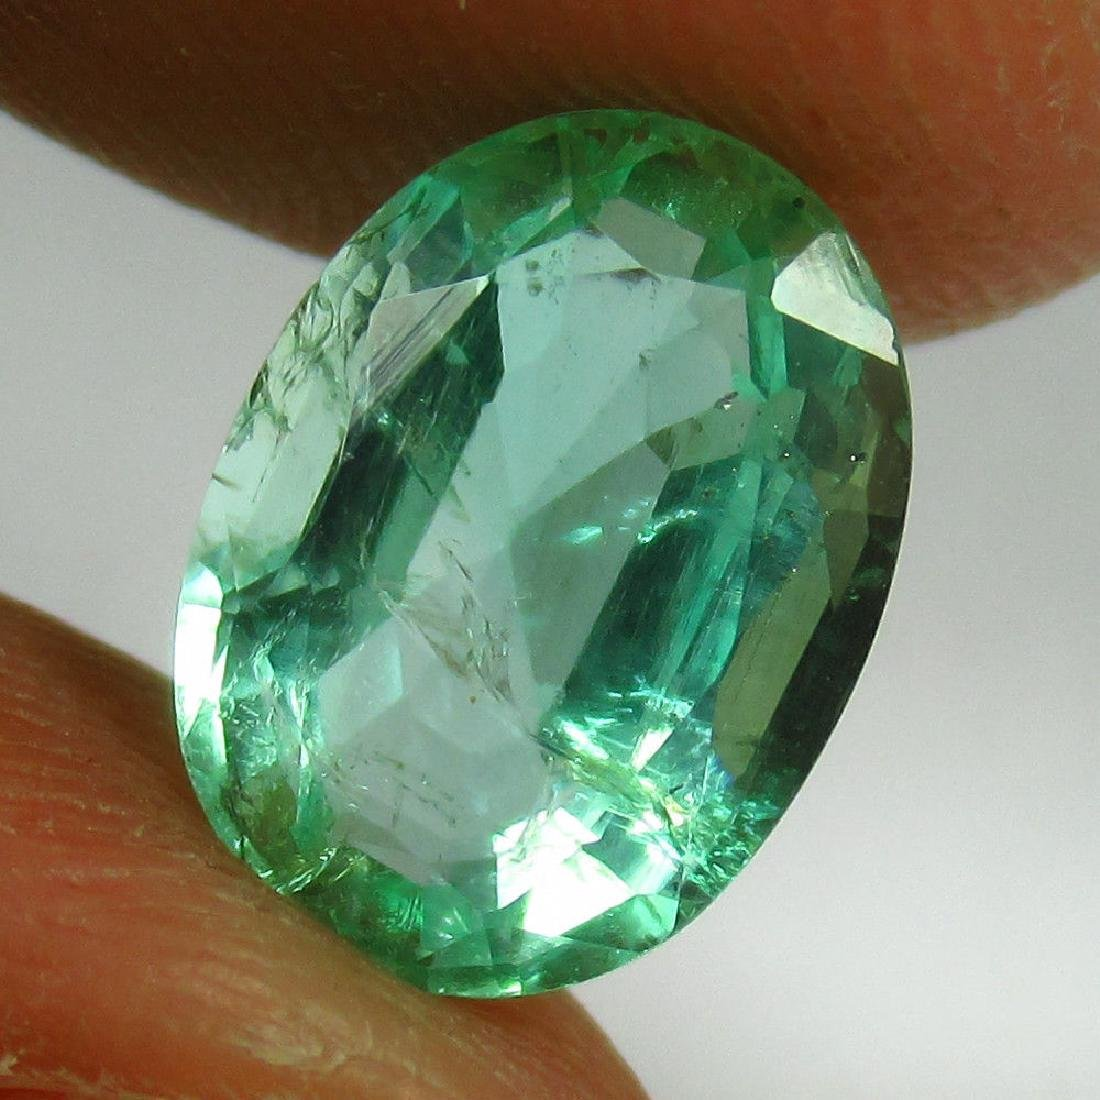 1.65 Ct Genuine Zambian Emerald Nice Oval Cut